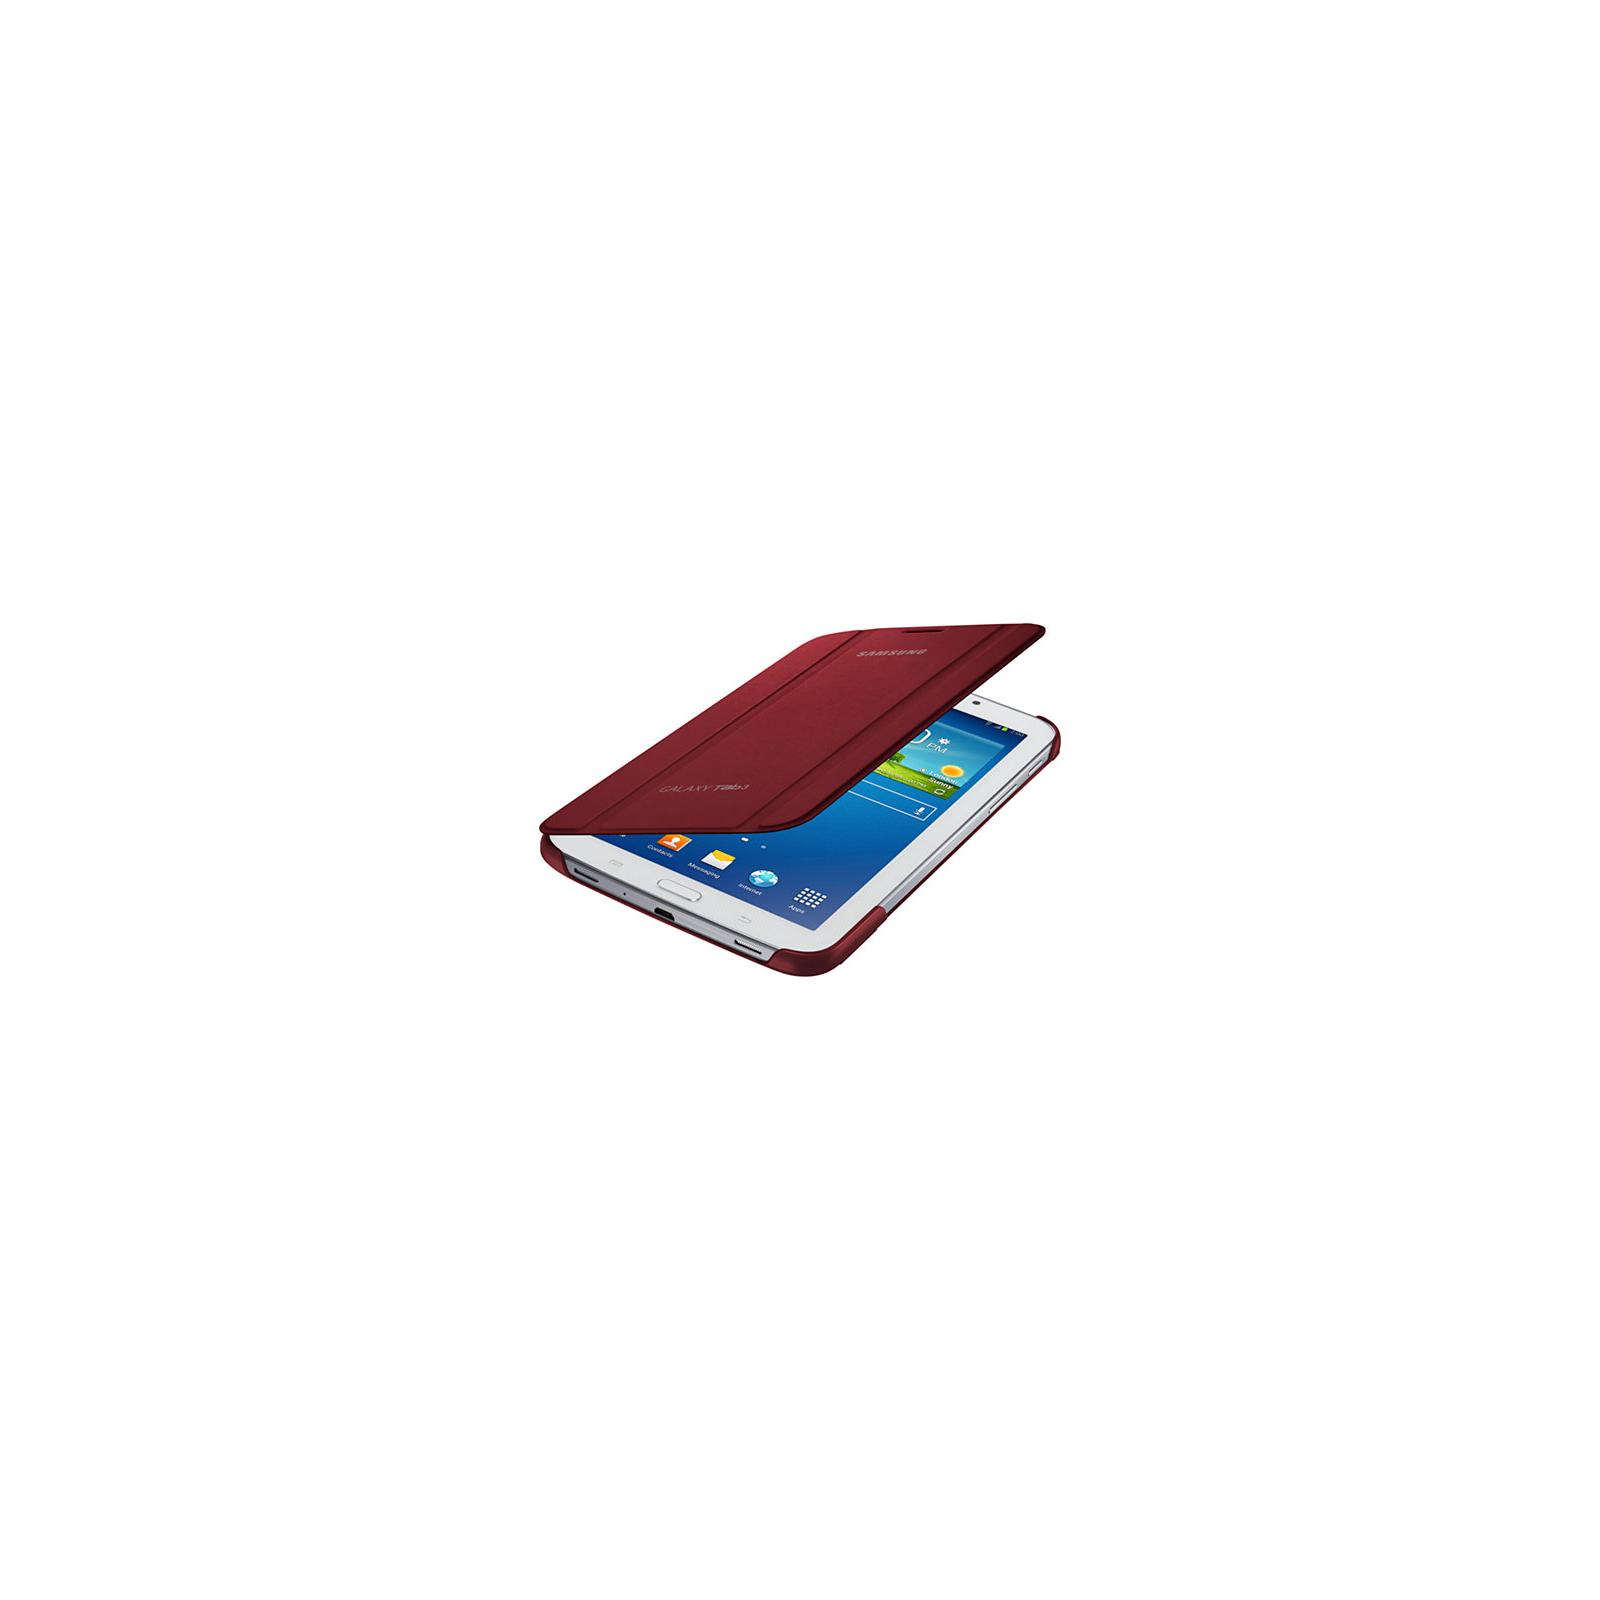 Чехол для планшета Samsung 7 GALAXY Tab 3 (EF-BT210BREGRU) изображение 3